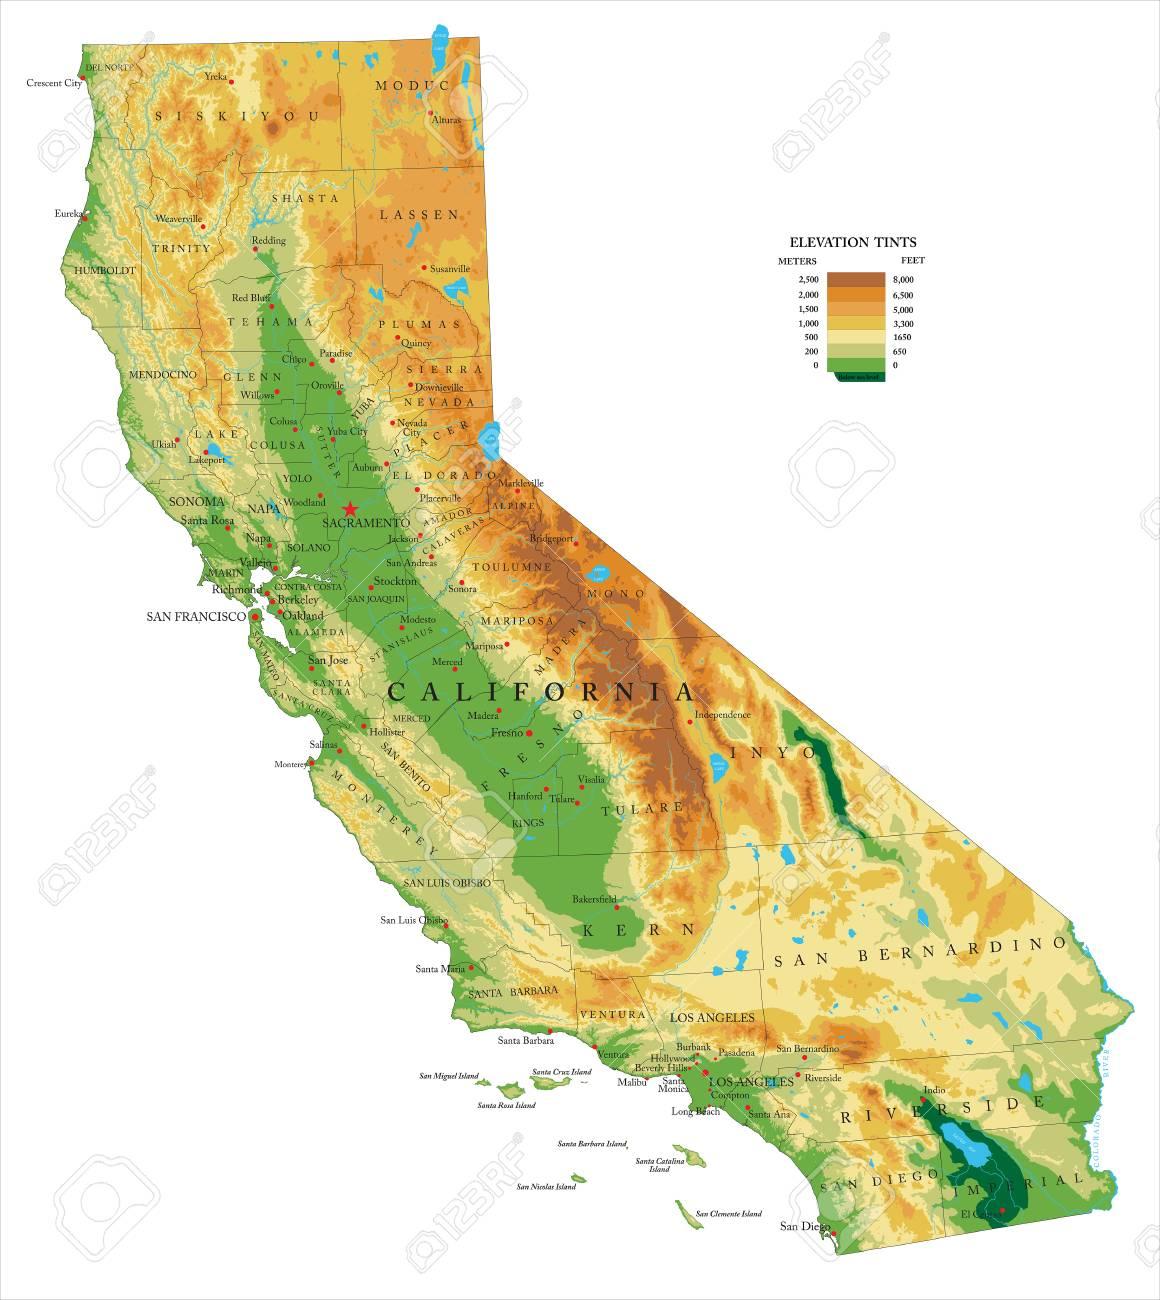 California physical map - 105110257